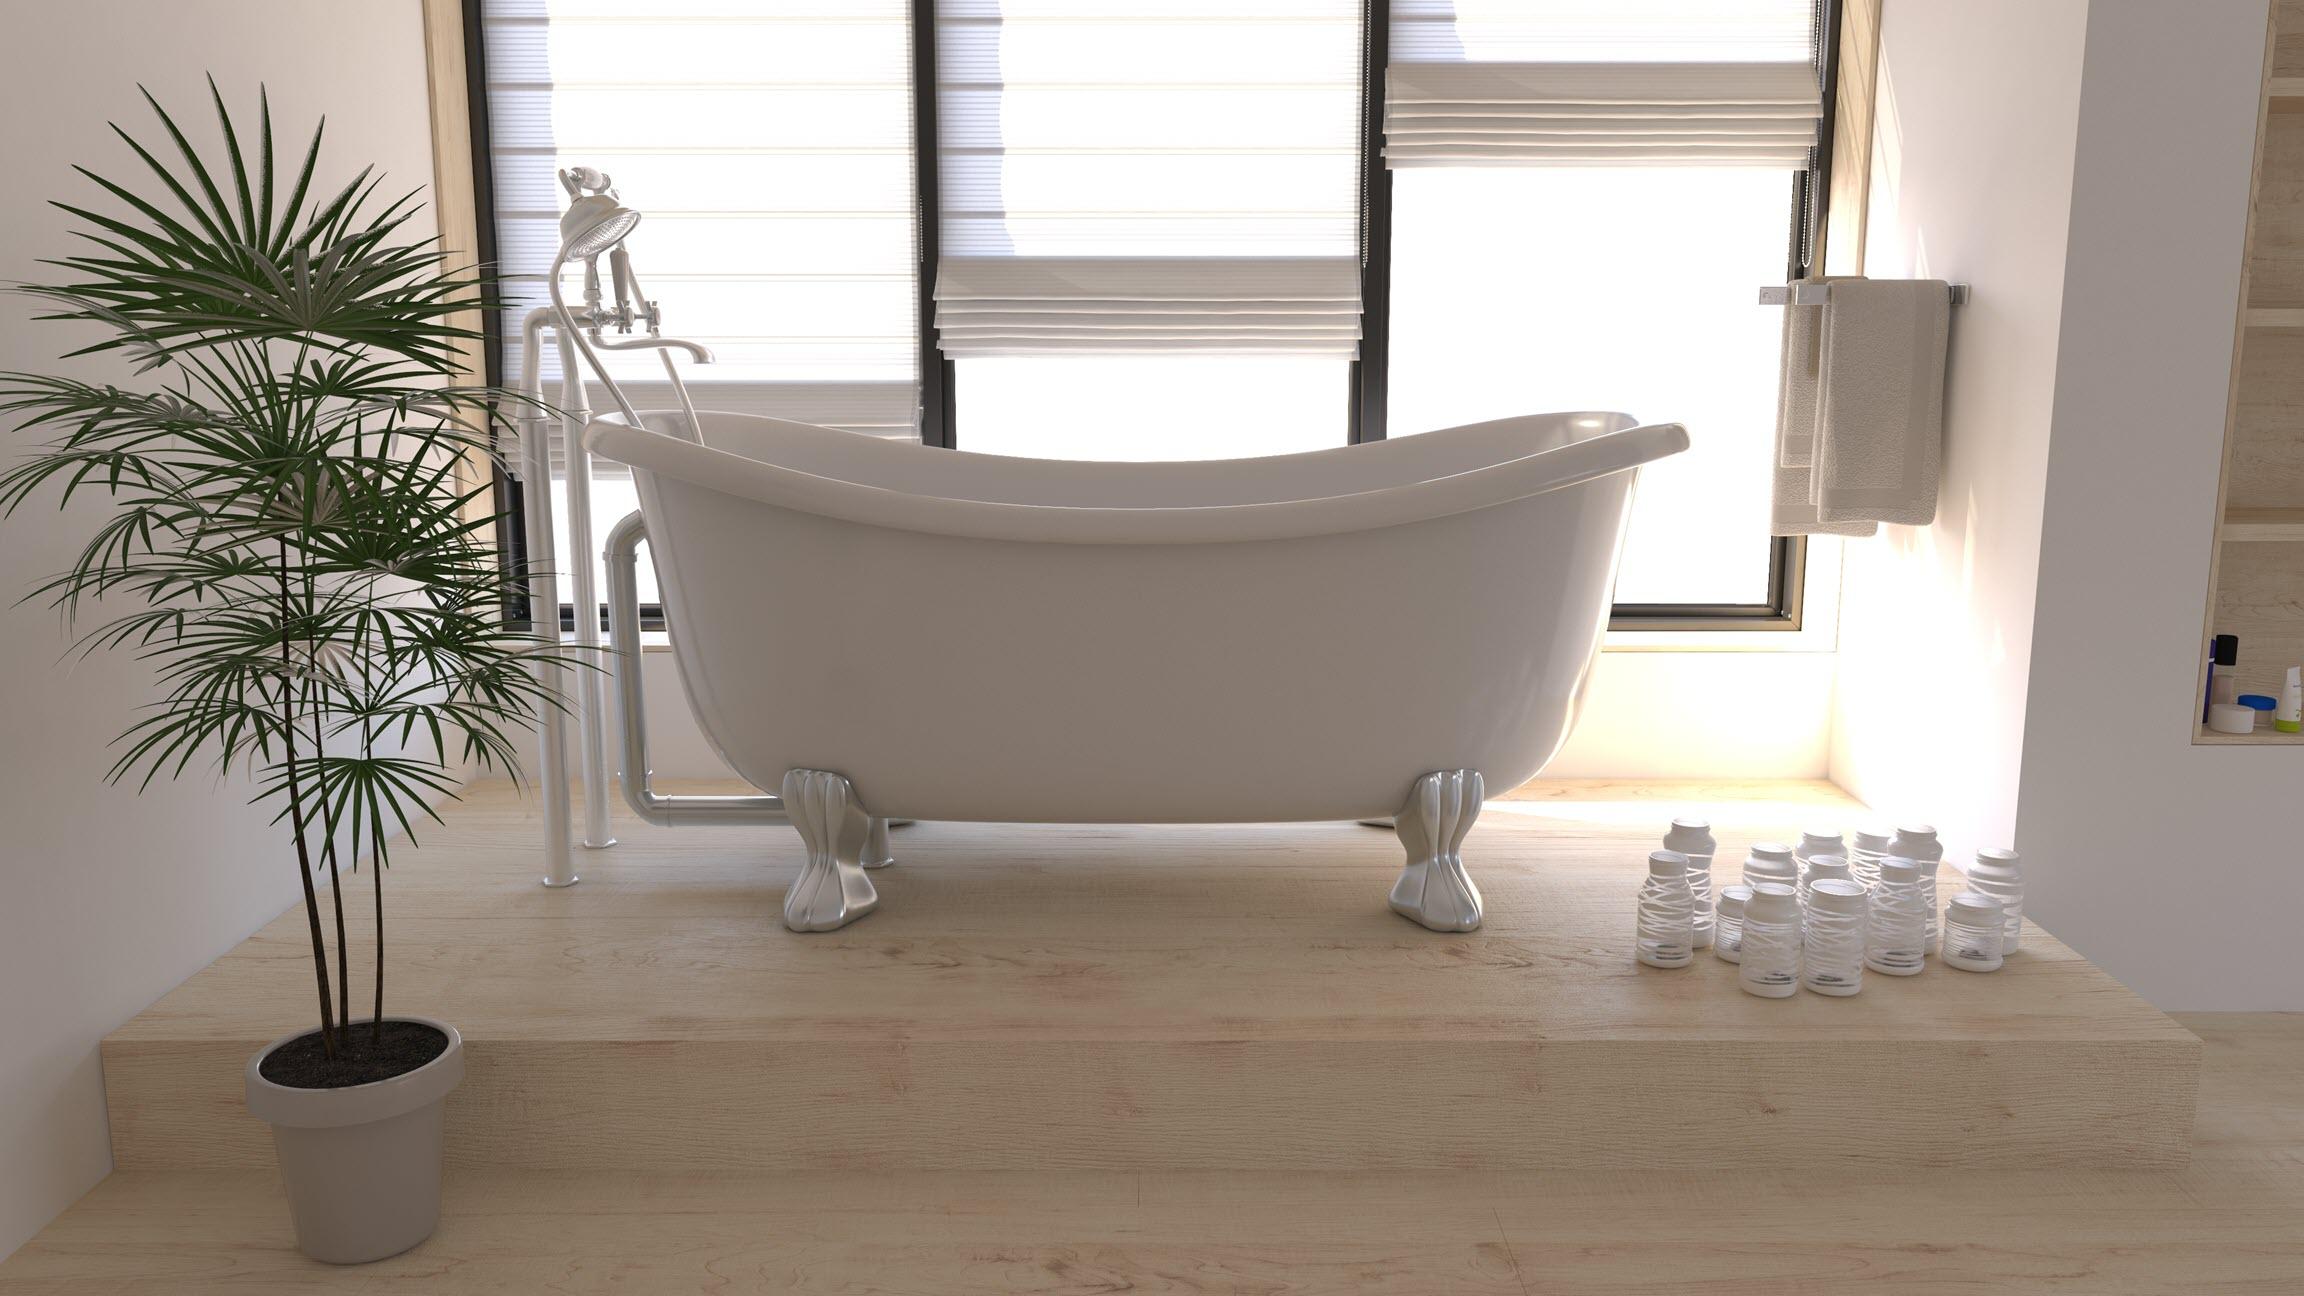 10-Simple-And-Beautiful-Bathroom-Decorating-Ideas-Bathtub-ideas